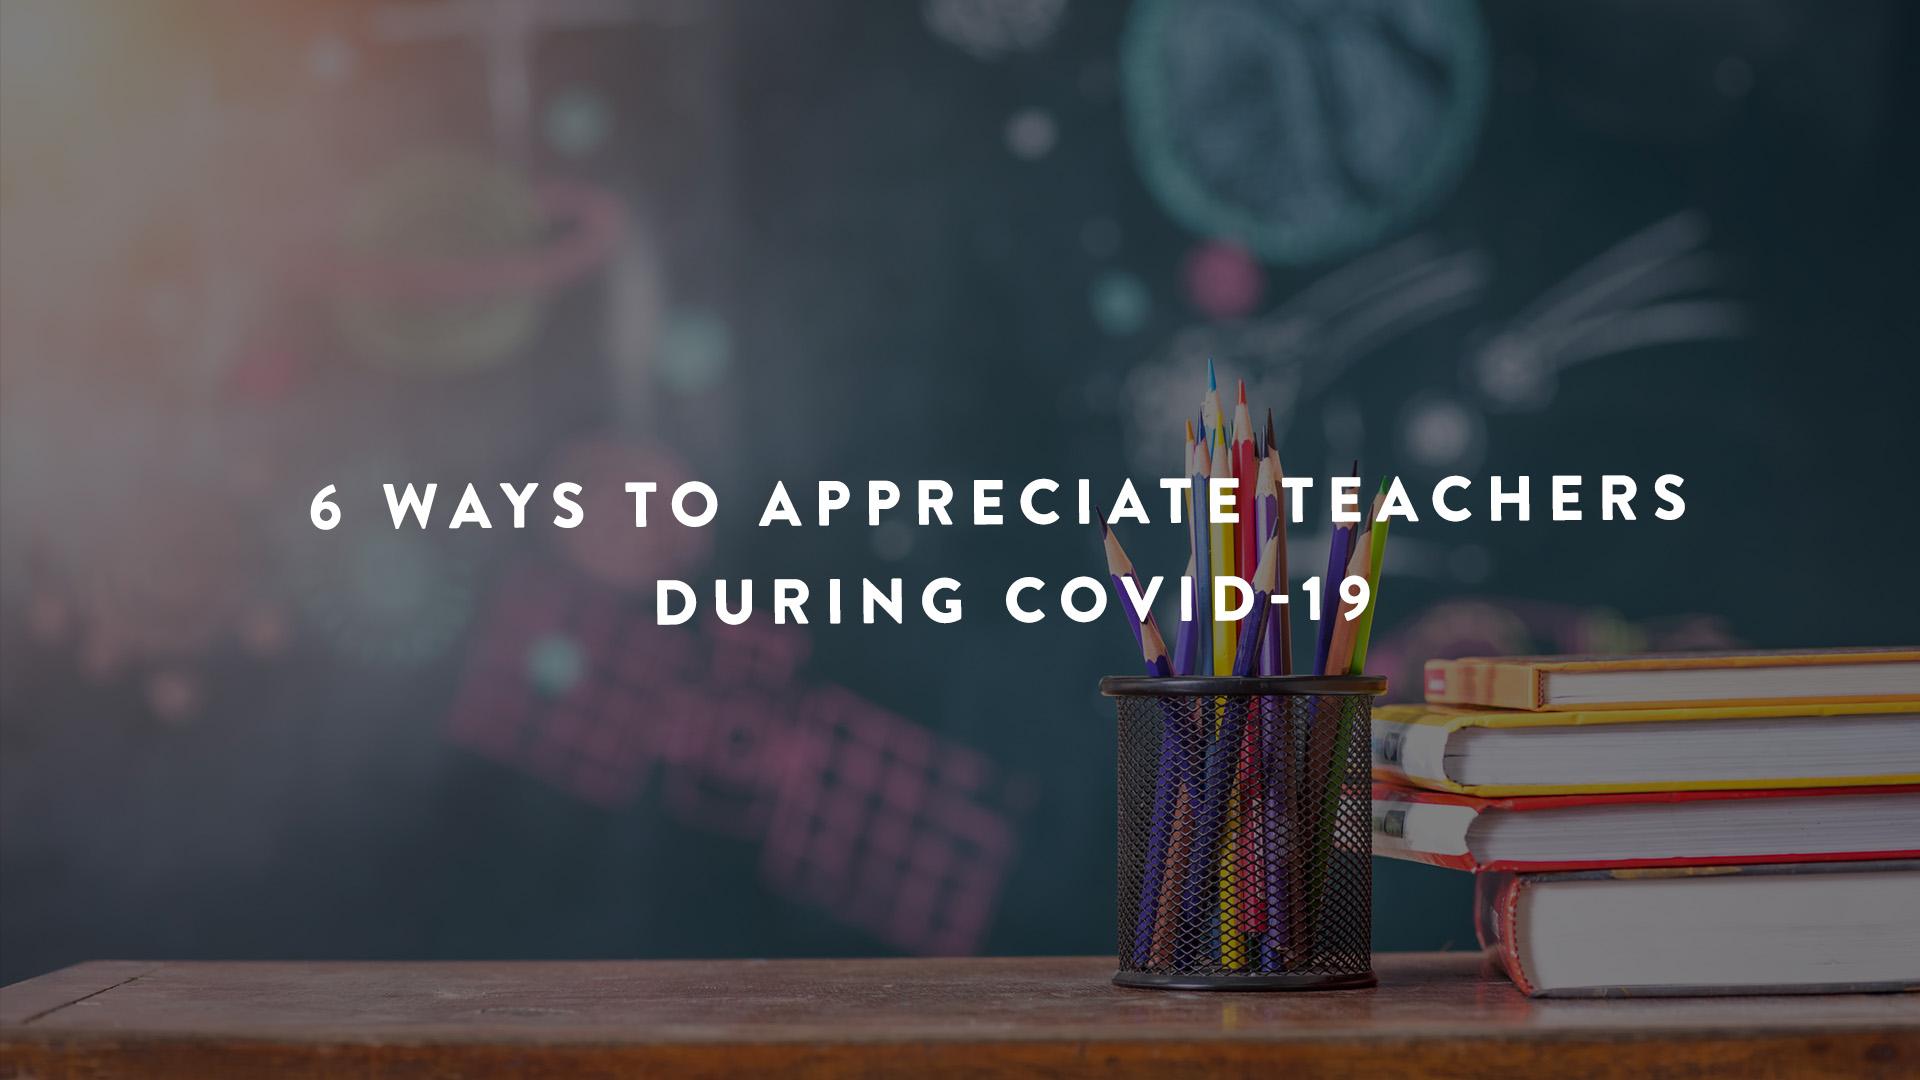 6 ways to appreciate teachers during Covid-19